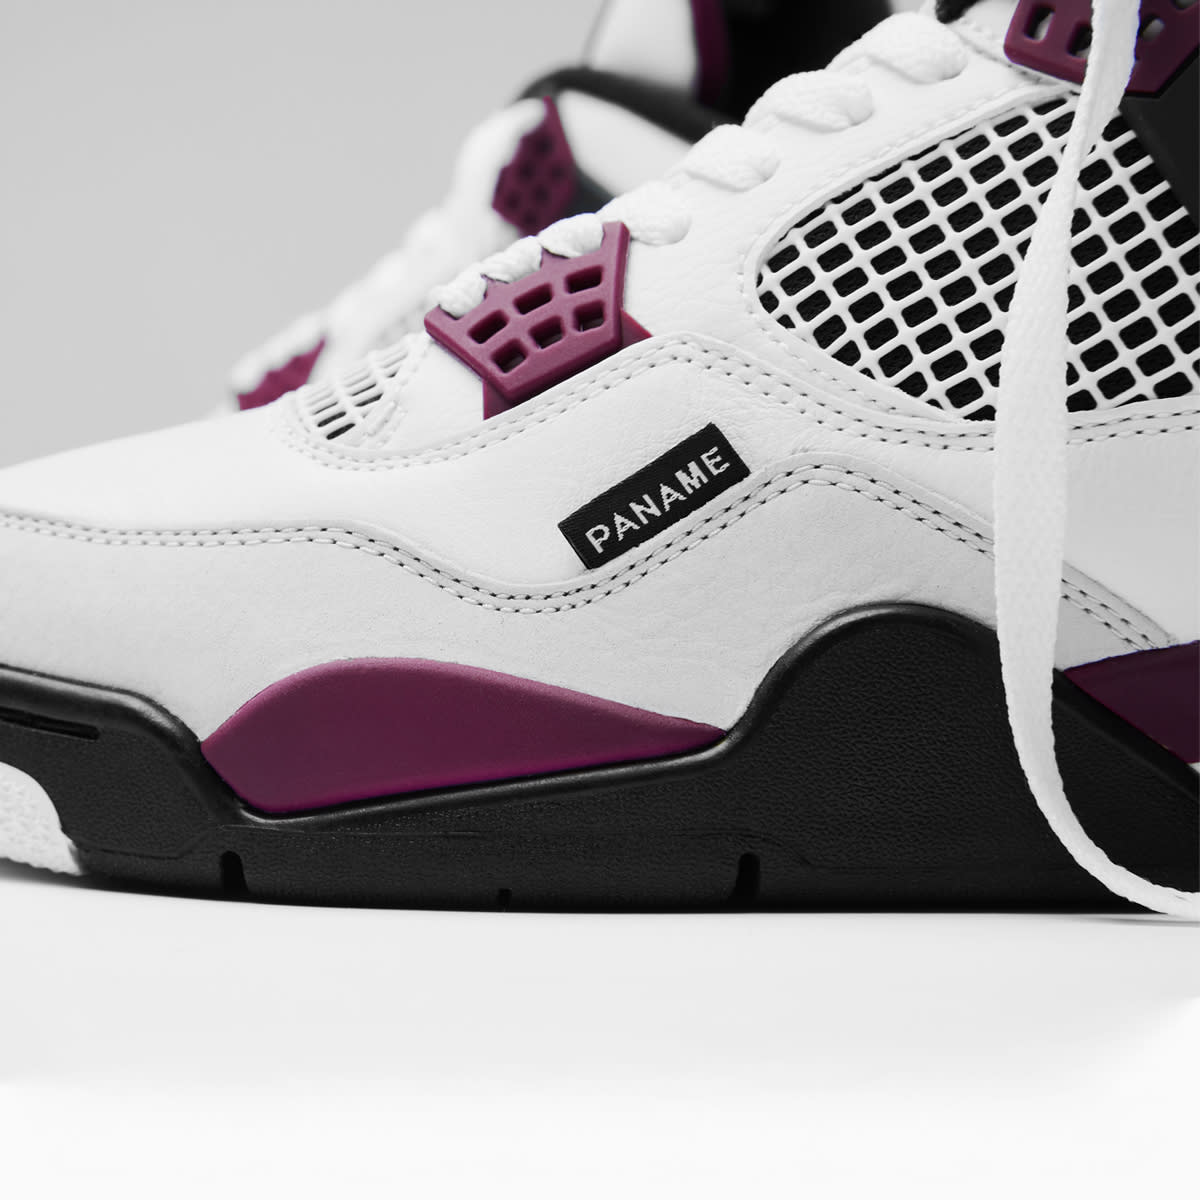 Nike Air Jordan 4 Retro Psg White Bordeaux Grey